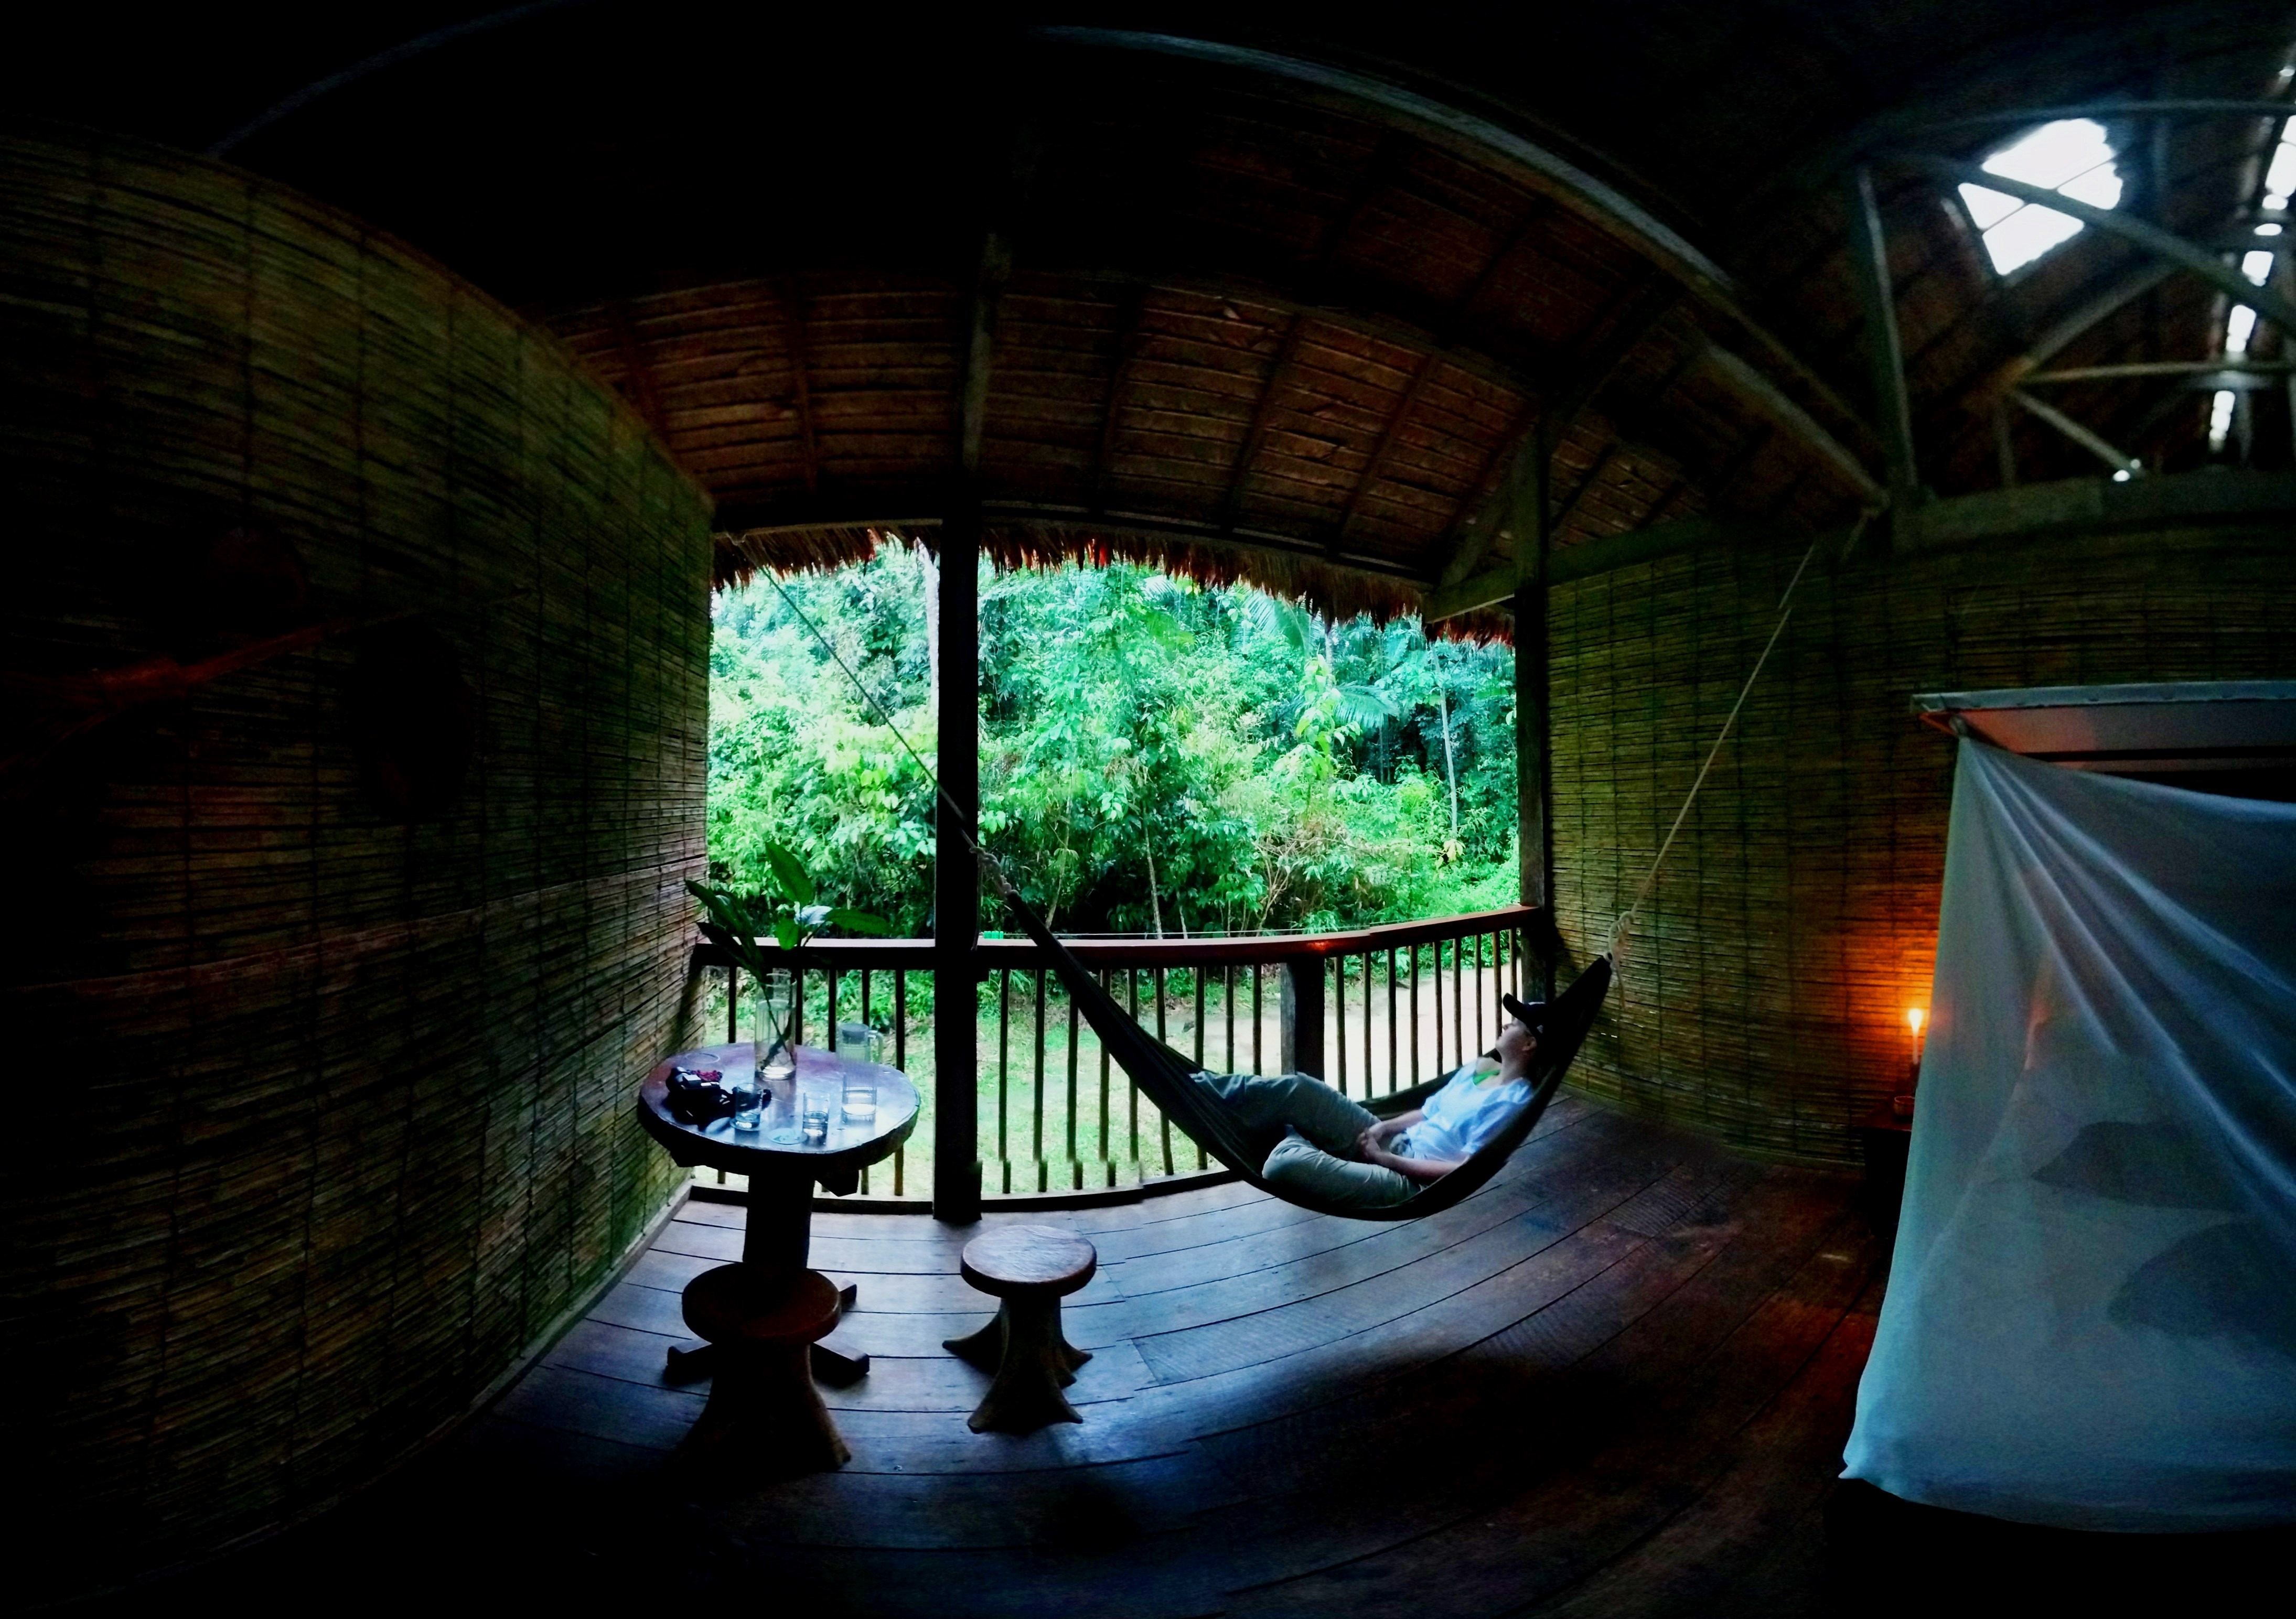 Tambopata national reserve